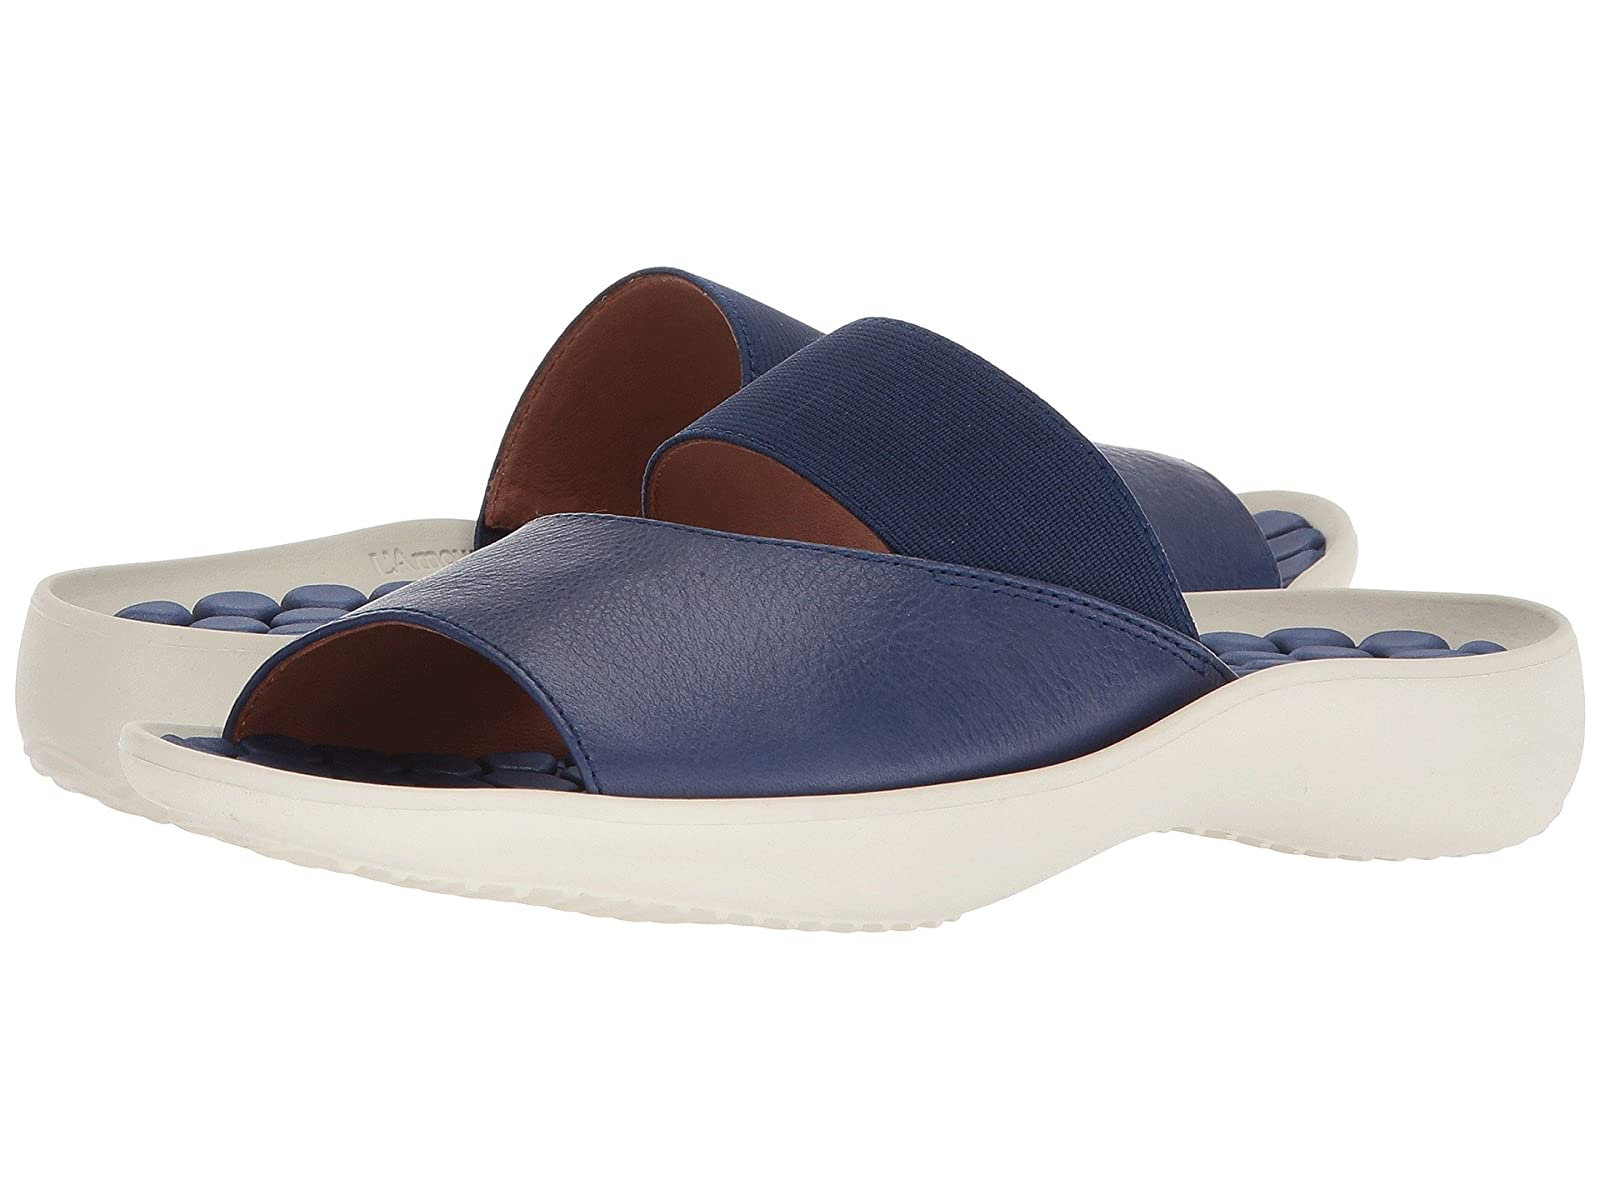 L'Amour Des Pieds NorthvilleCheap and distinctive eye-catching shoes